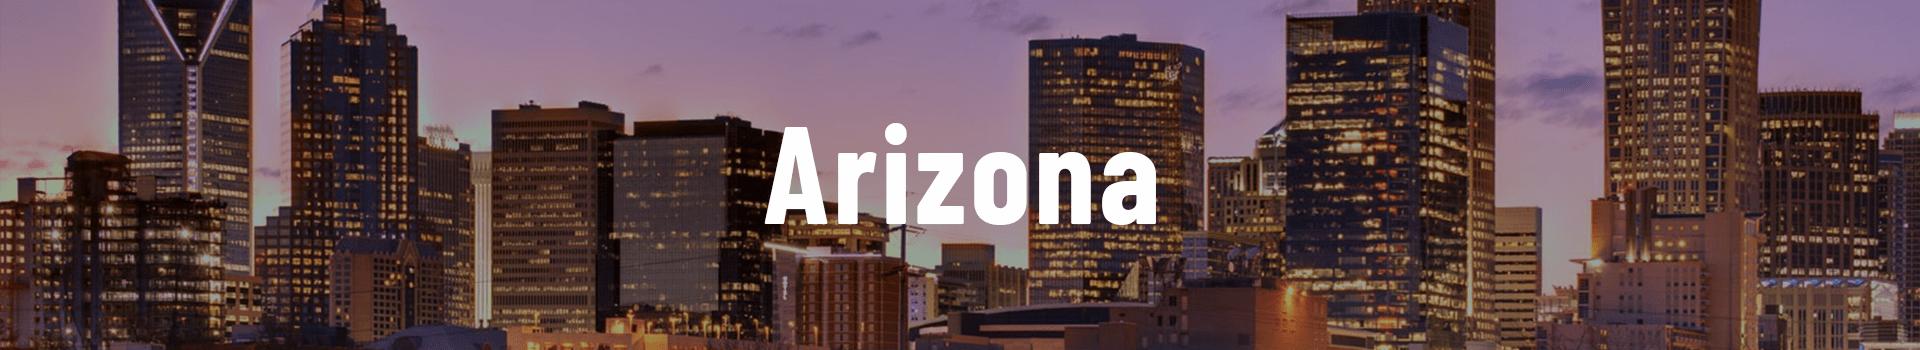 Arizona, Arizona Personal Injury Lawyer, Sierra Legal Group, Sierra Legal Group Arizona, AZ Personal Injury Attorney, Personal Injury Attorneys in Arizona